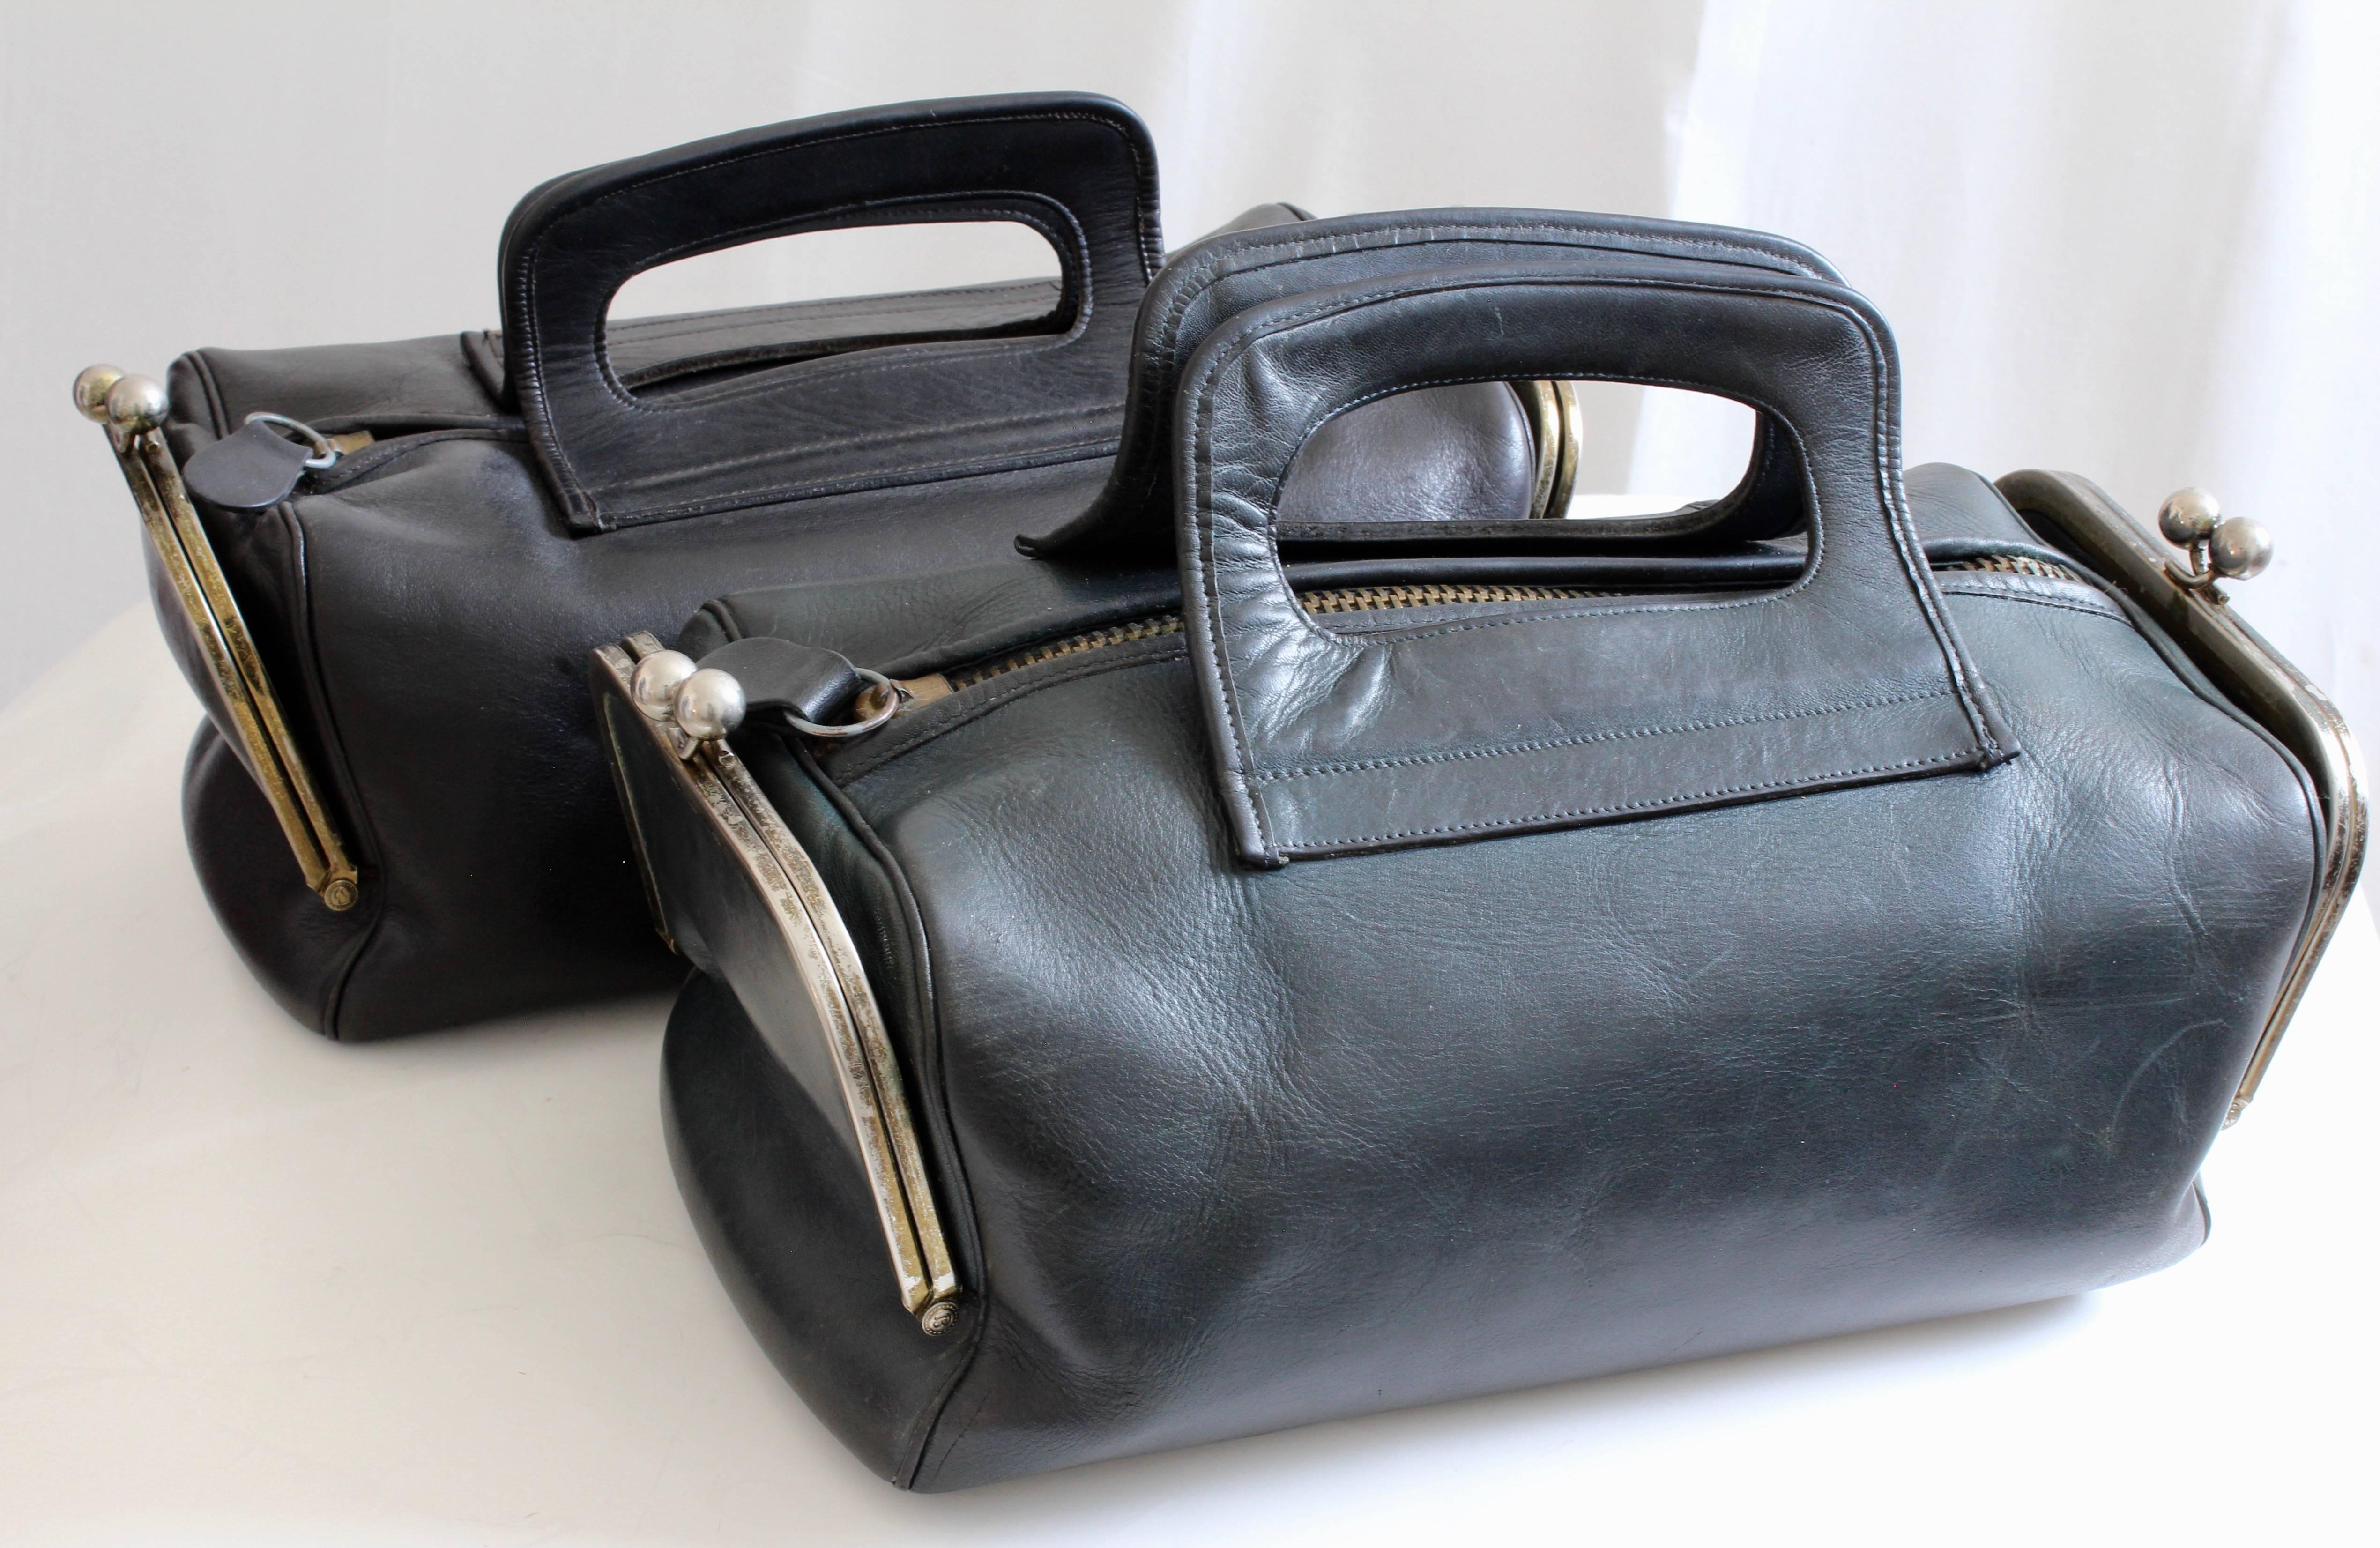 f32787605a ... cheap bonnie cashin for coach leather tote bag double header kiss lock  rare 1960s for sale